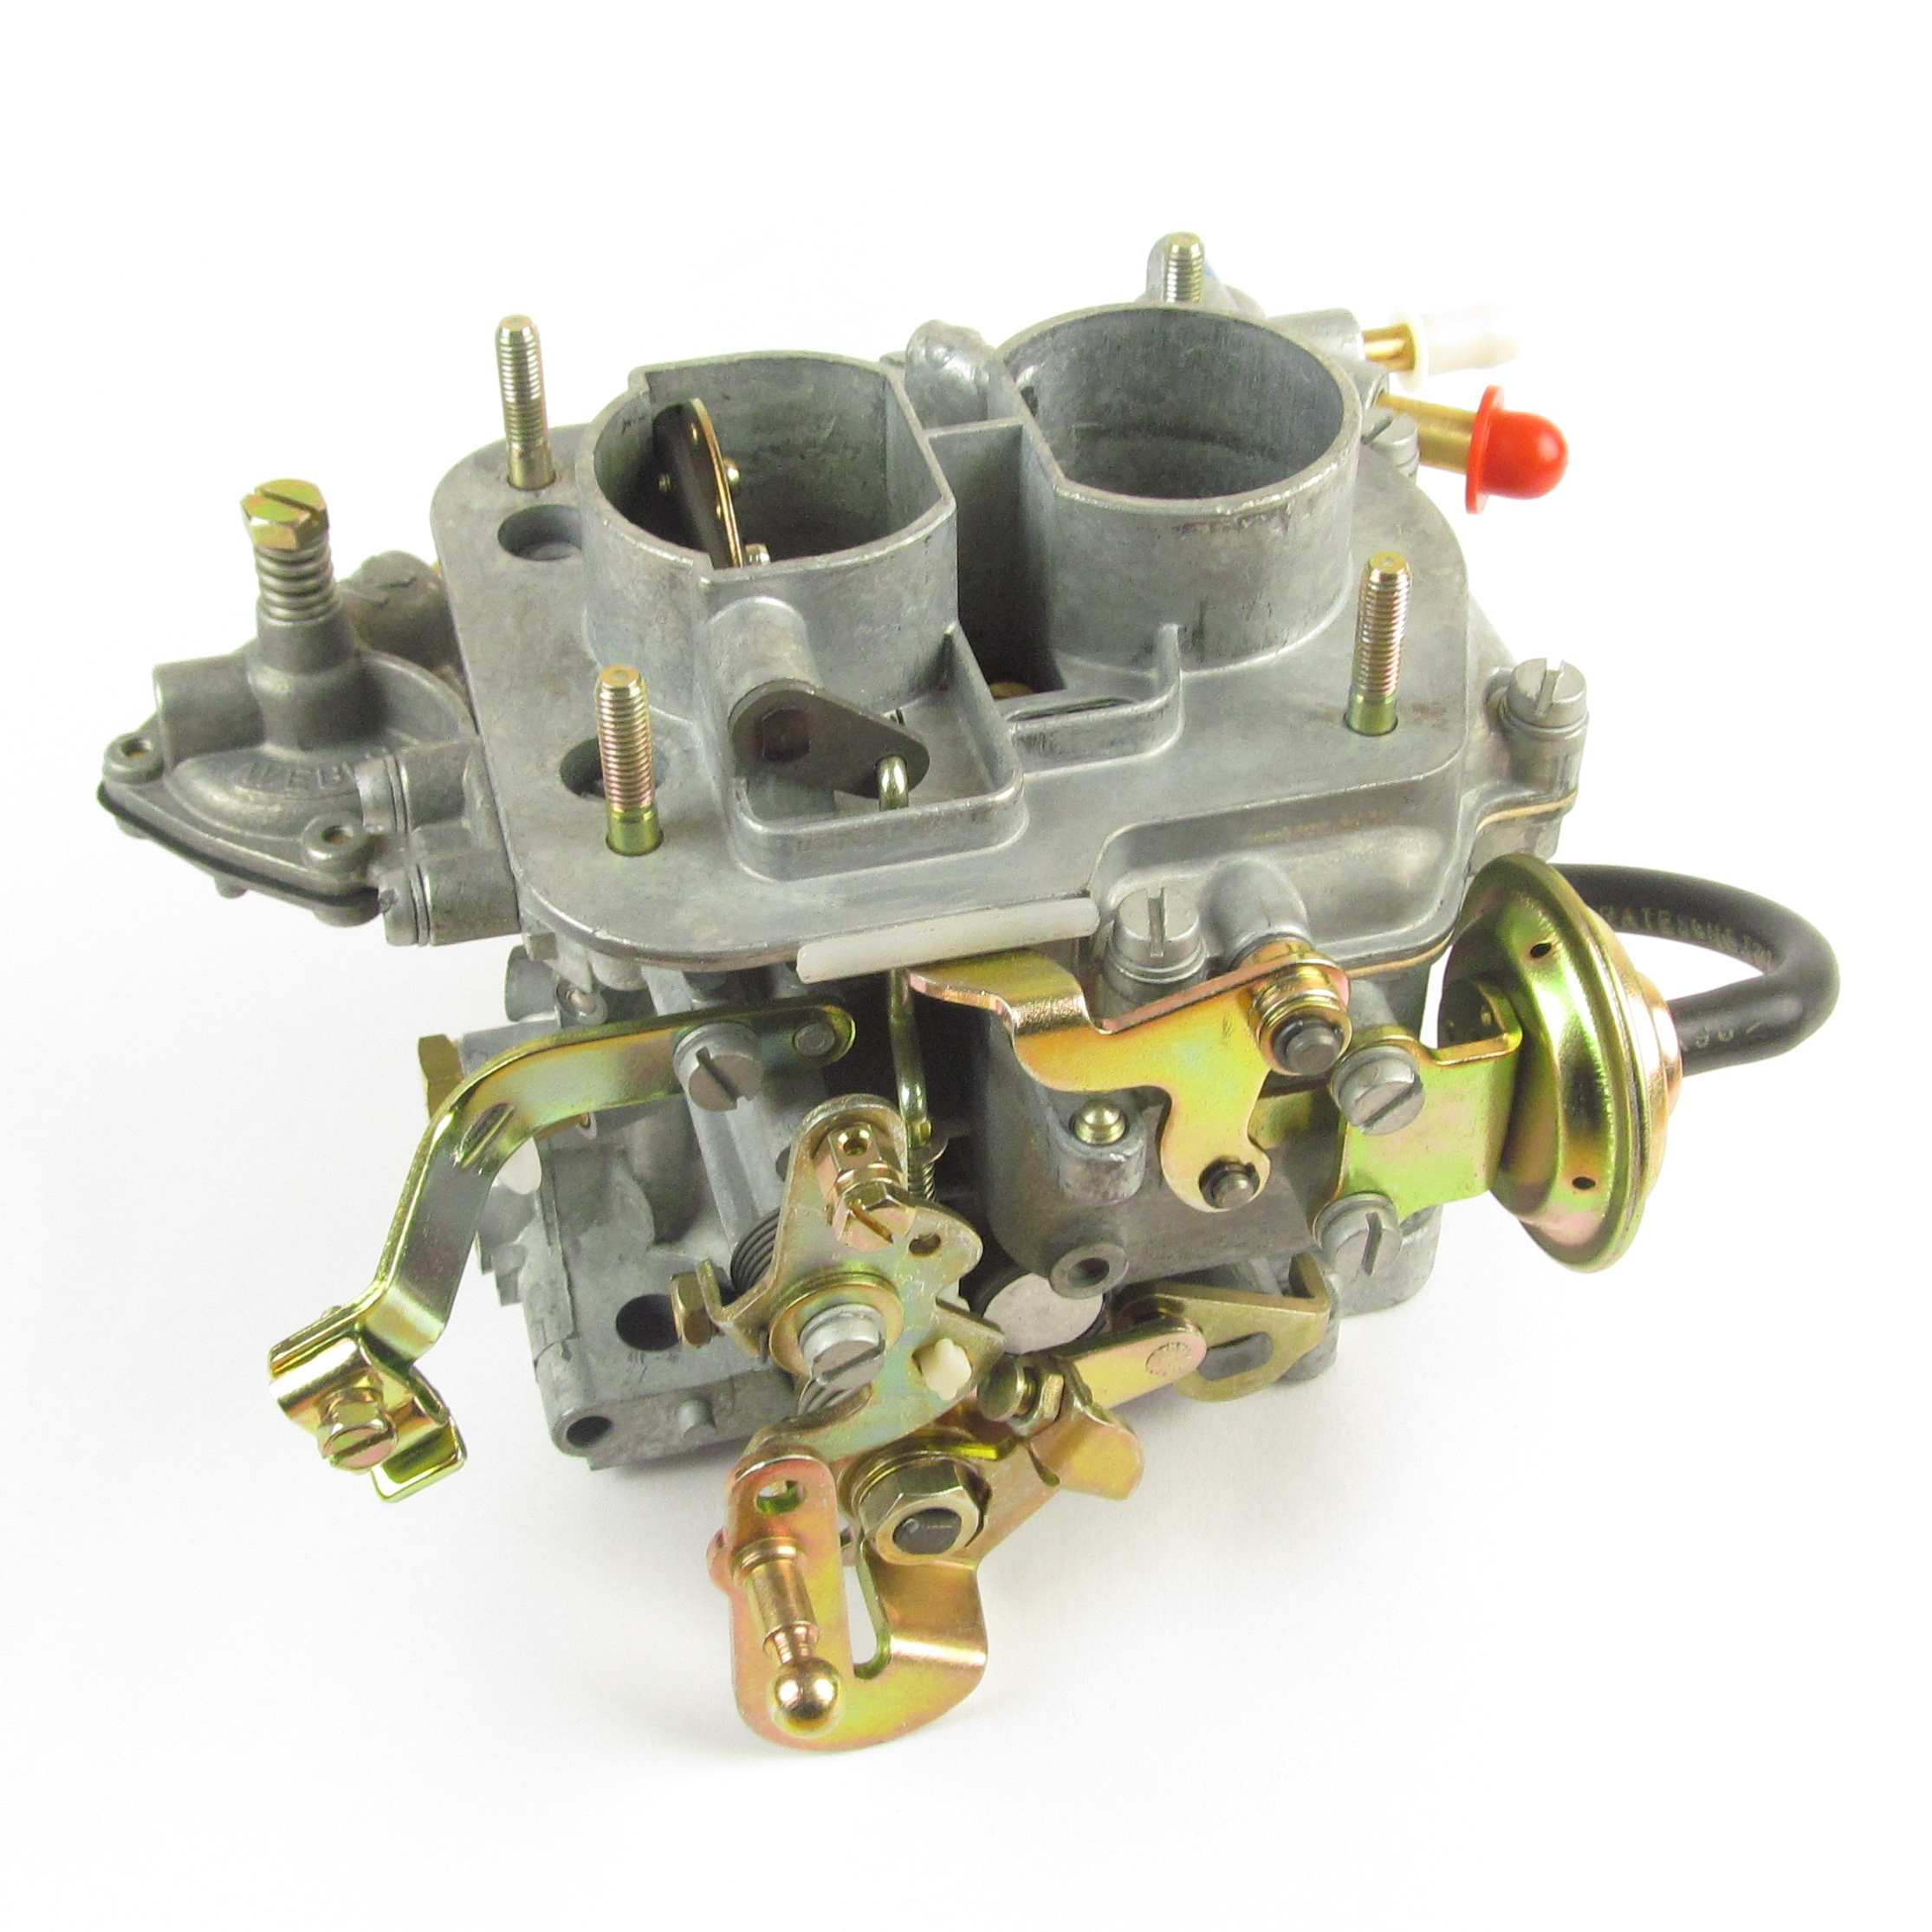 WEBER 30/32 DMTR CARB CLASSIC FIAT 1000 ABARTH/LANCIA/AUTOBIANCHI/YUGO ETC..